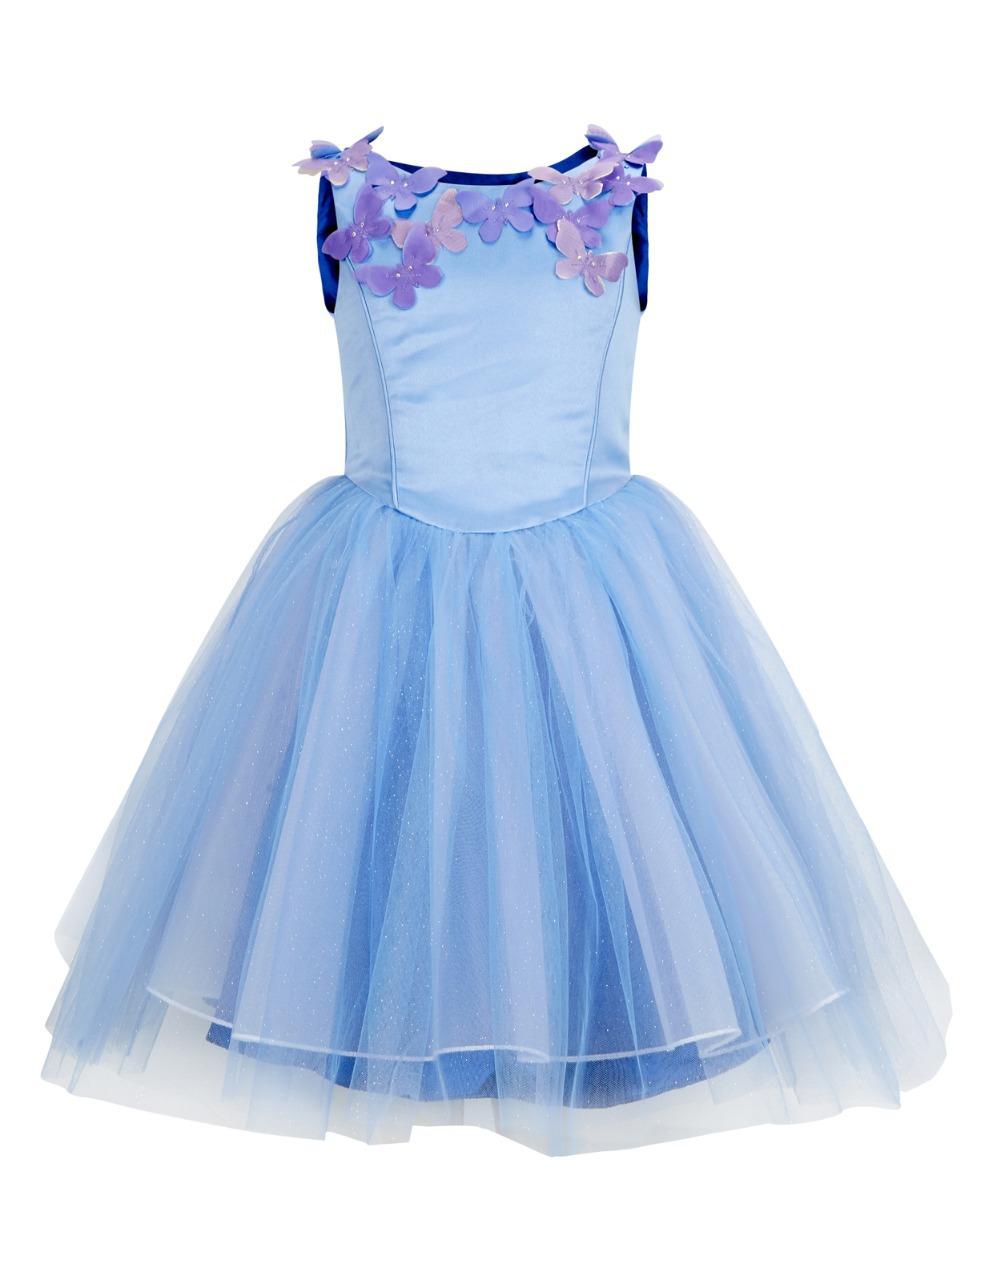 Delicate Party Princess Prom Dress Zipper Vintage Light